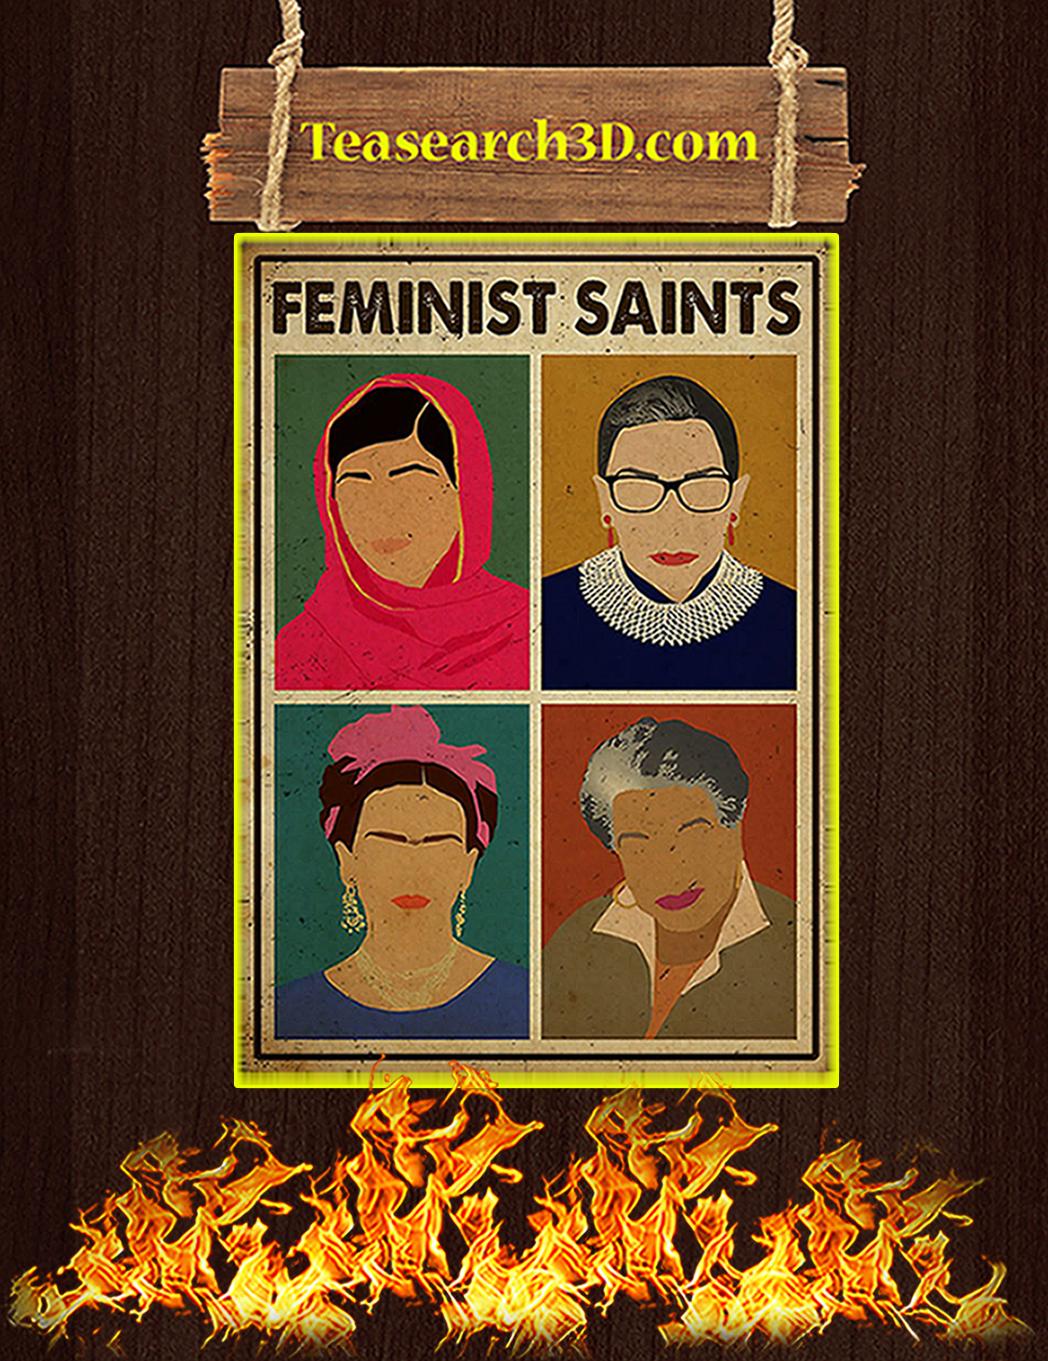 Feminist saints poster A1